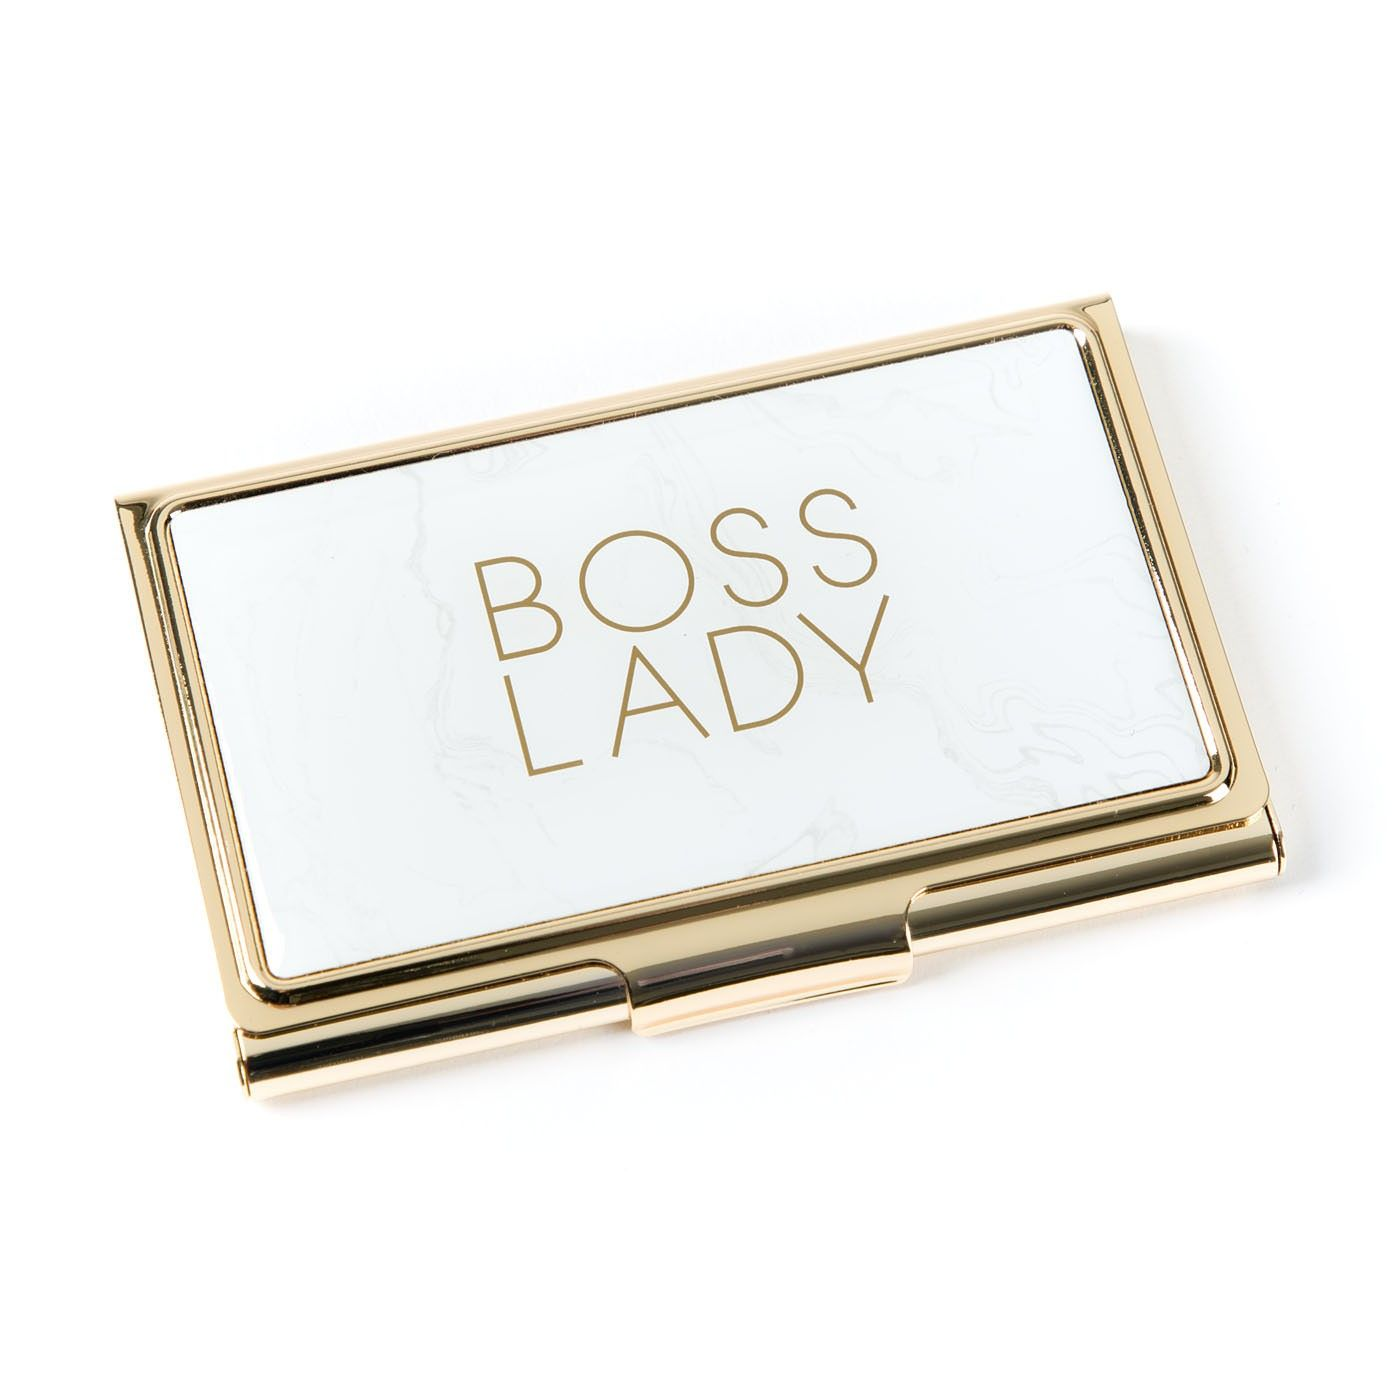 Boss Lady Business Card Holder | Home Office | Pinterest | Boss lady ...